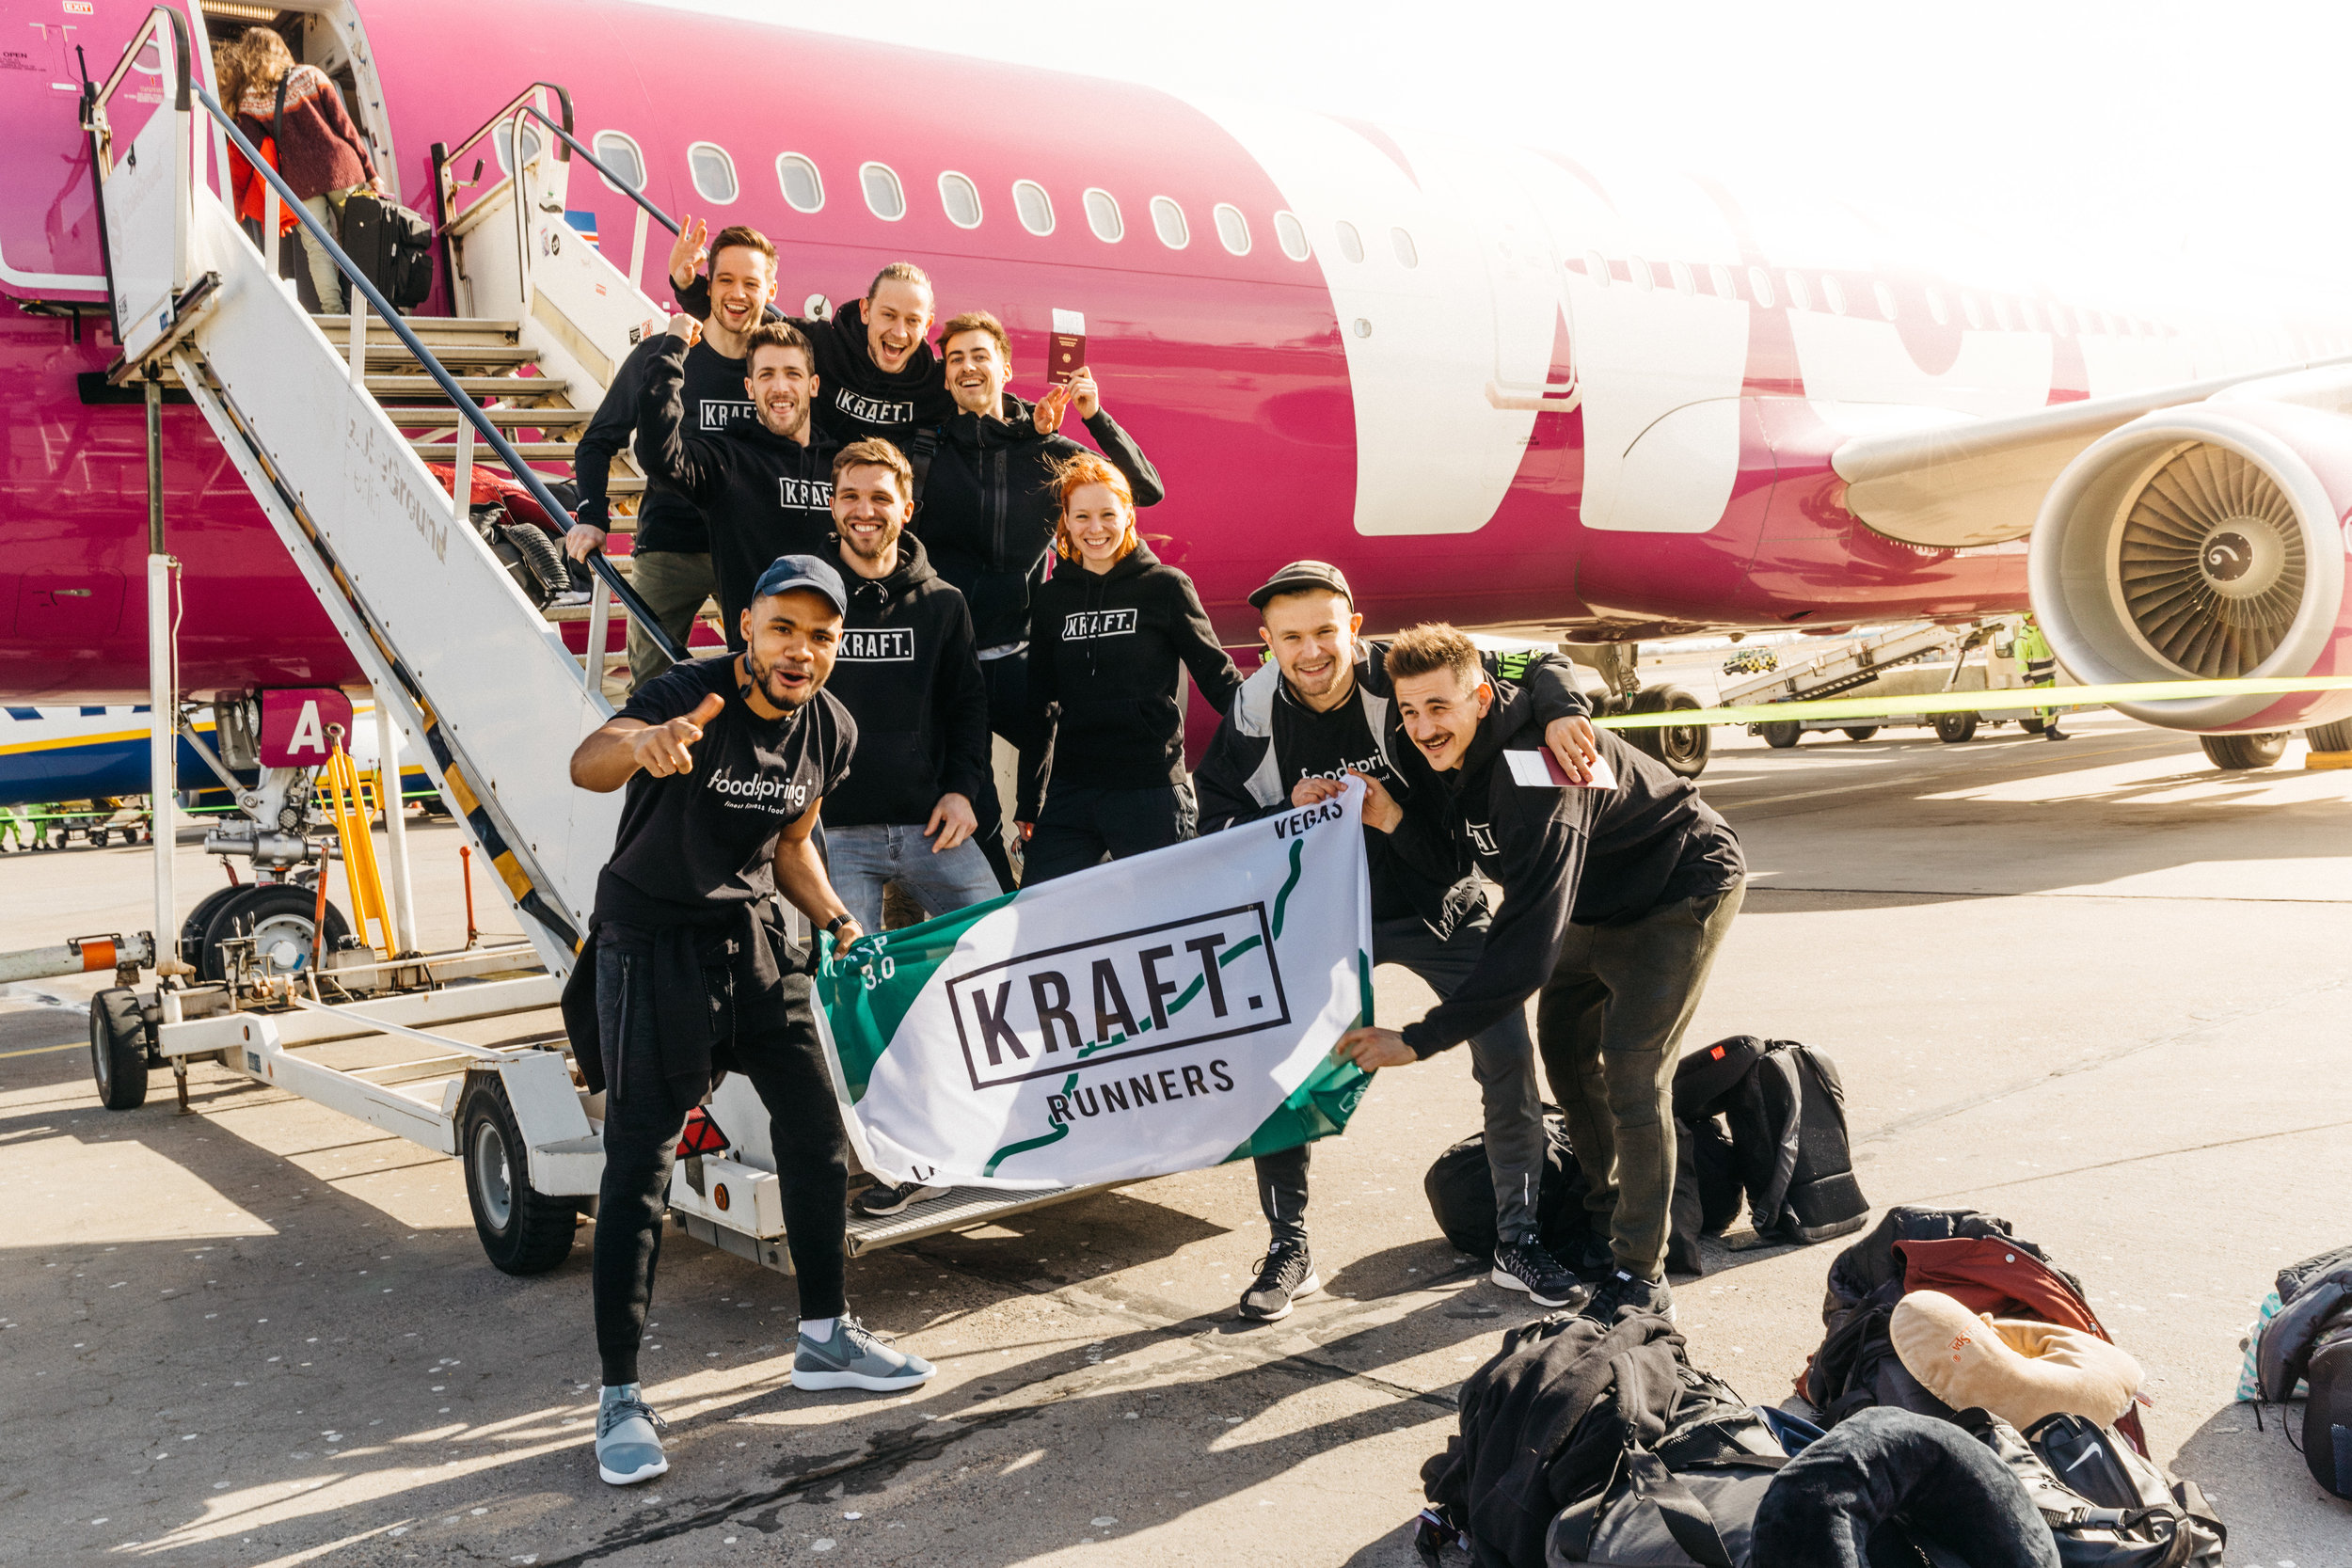 kraftrunners_tsp_flight